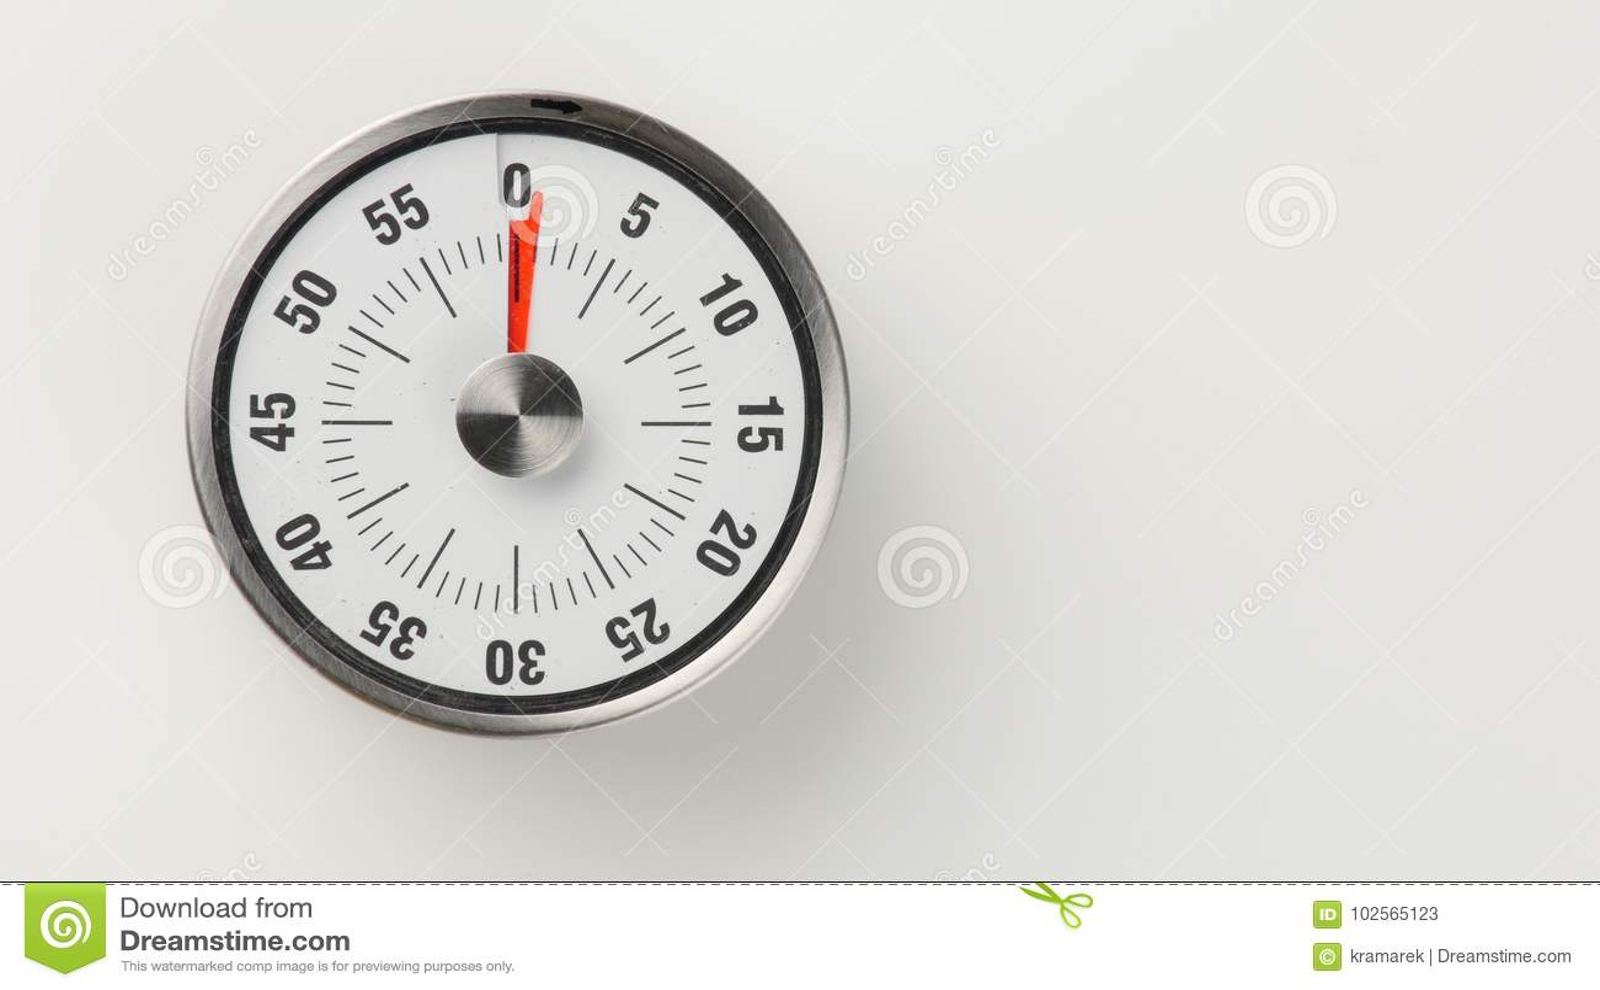 kitchen clocks white cabinets lowes 葡萄酒模式厨房读秒定时器 1周详保持库存图片 图片包括有分析 格式 与古典时钟表盘的葡萄酒模式厨房读秒定时器和红色剩余的时间显示 1周详左边 射击的关闭与拷贝空间